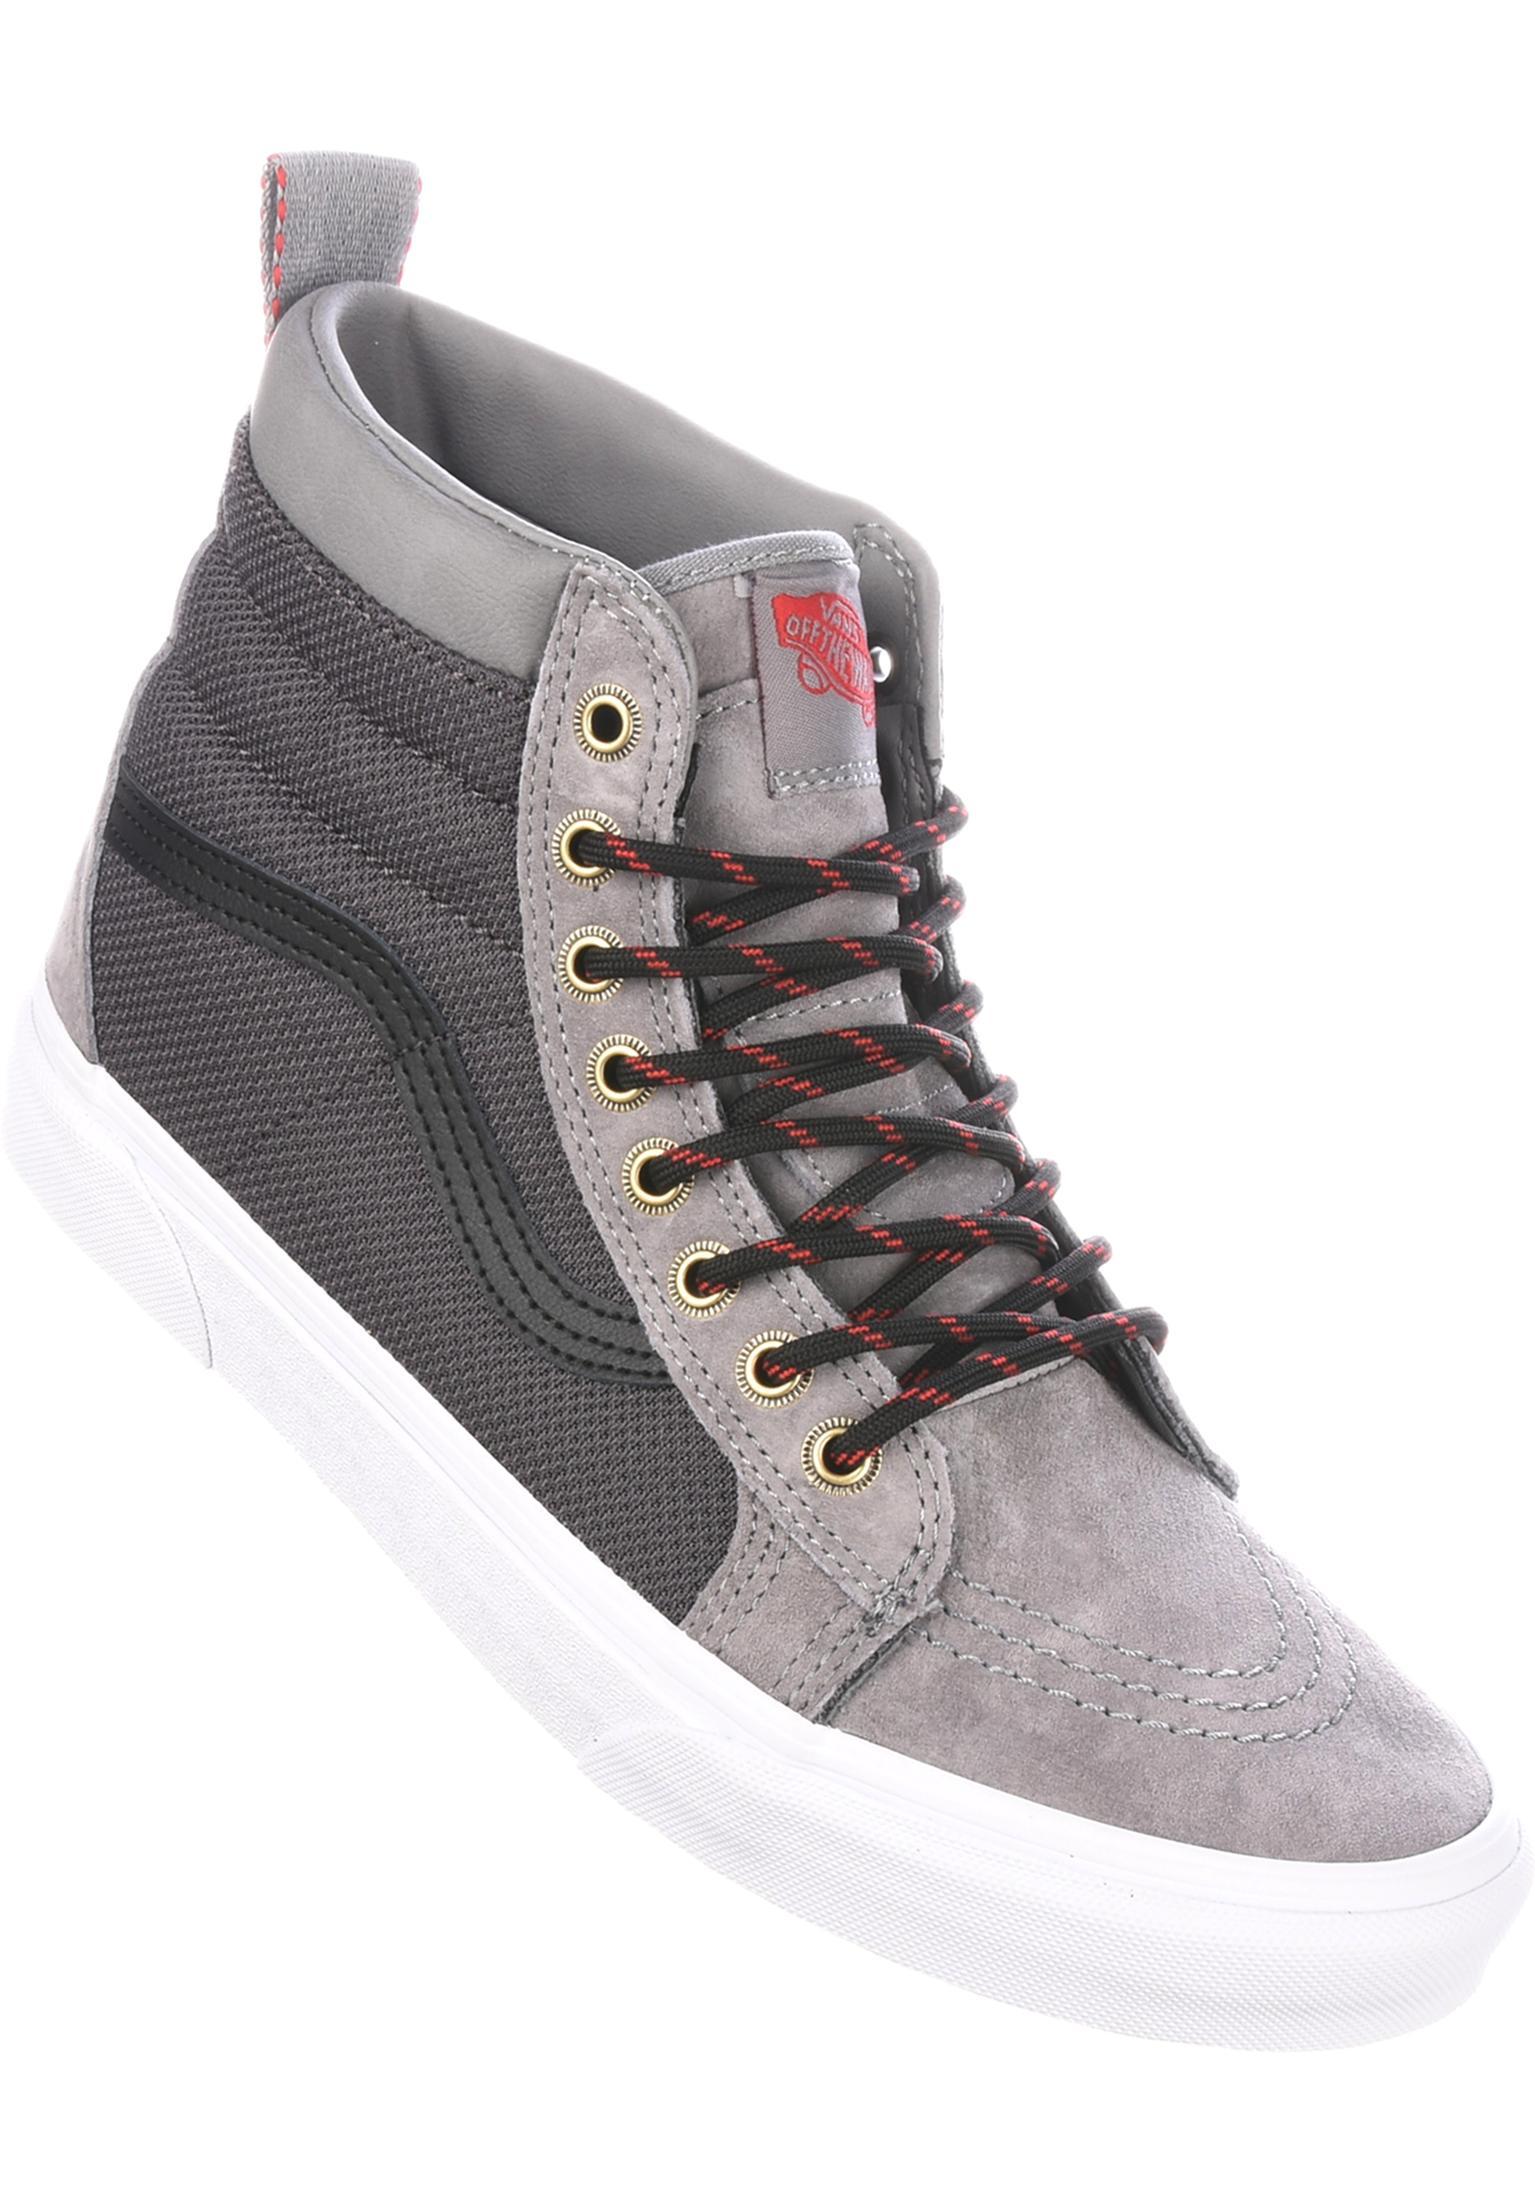 978f202a0f Sk8 Hi MTE Vans All Shoes in frostgray-ballistic for Men